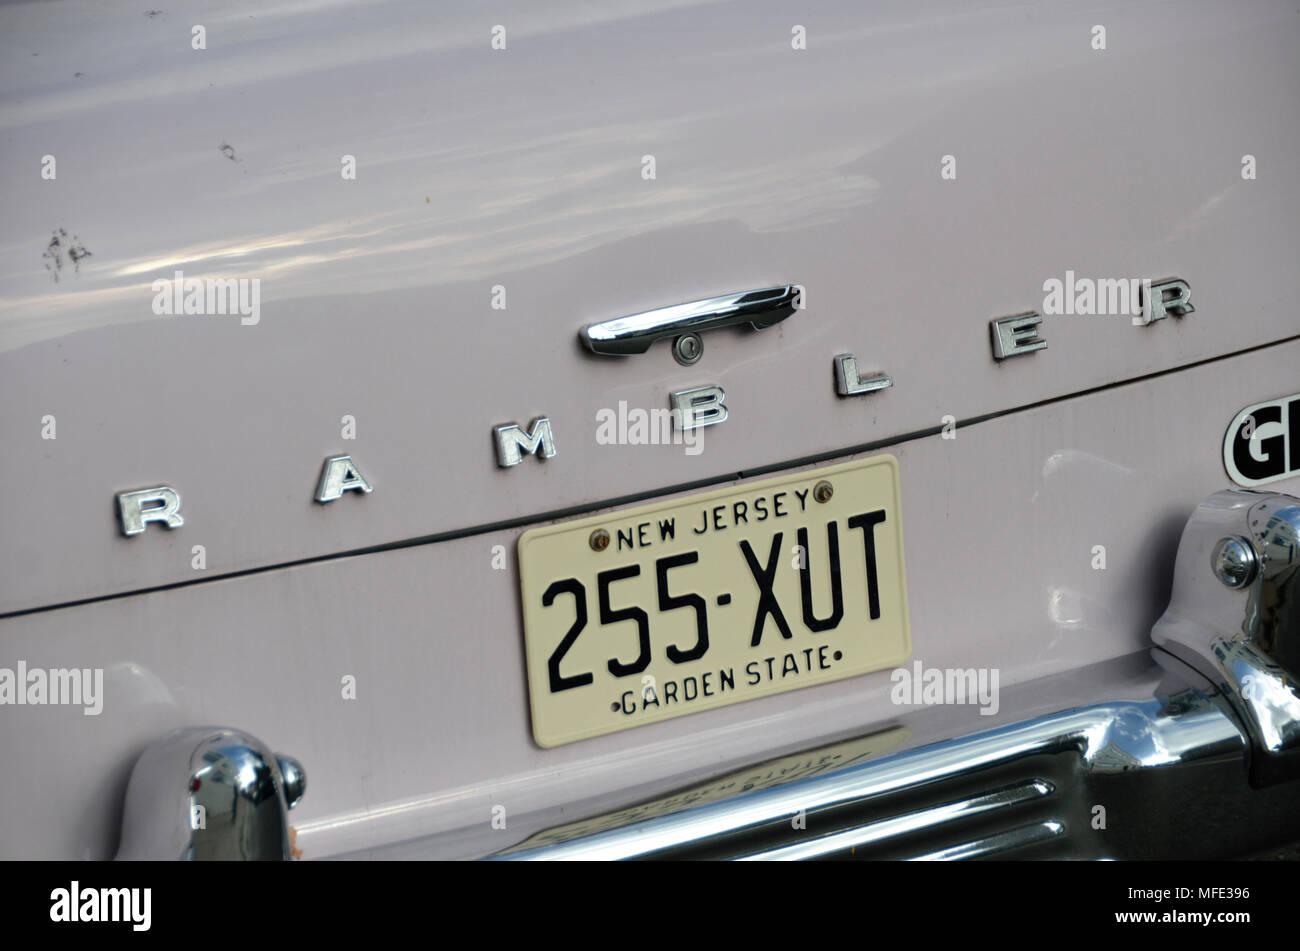 Grey vintage Rambler car - Stock Image